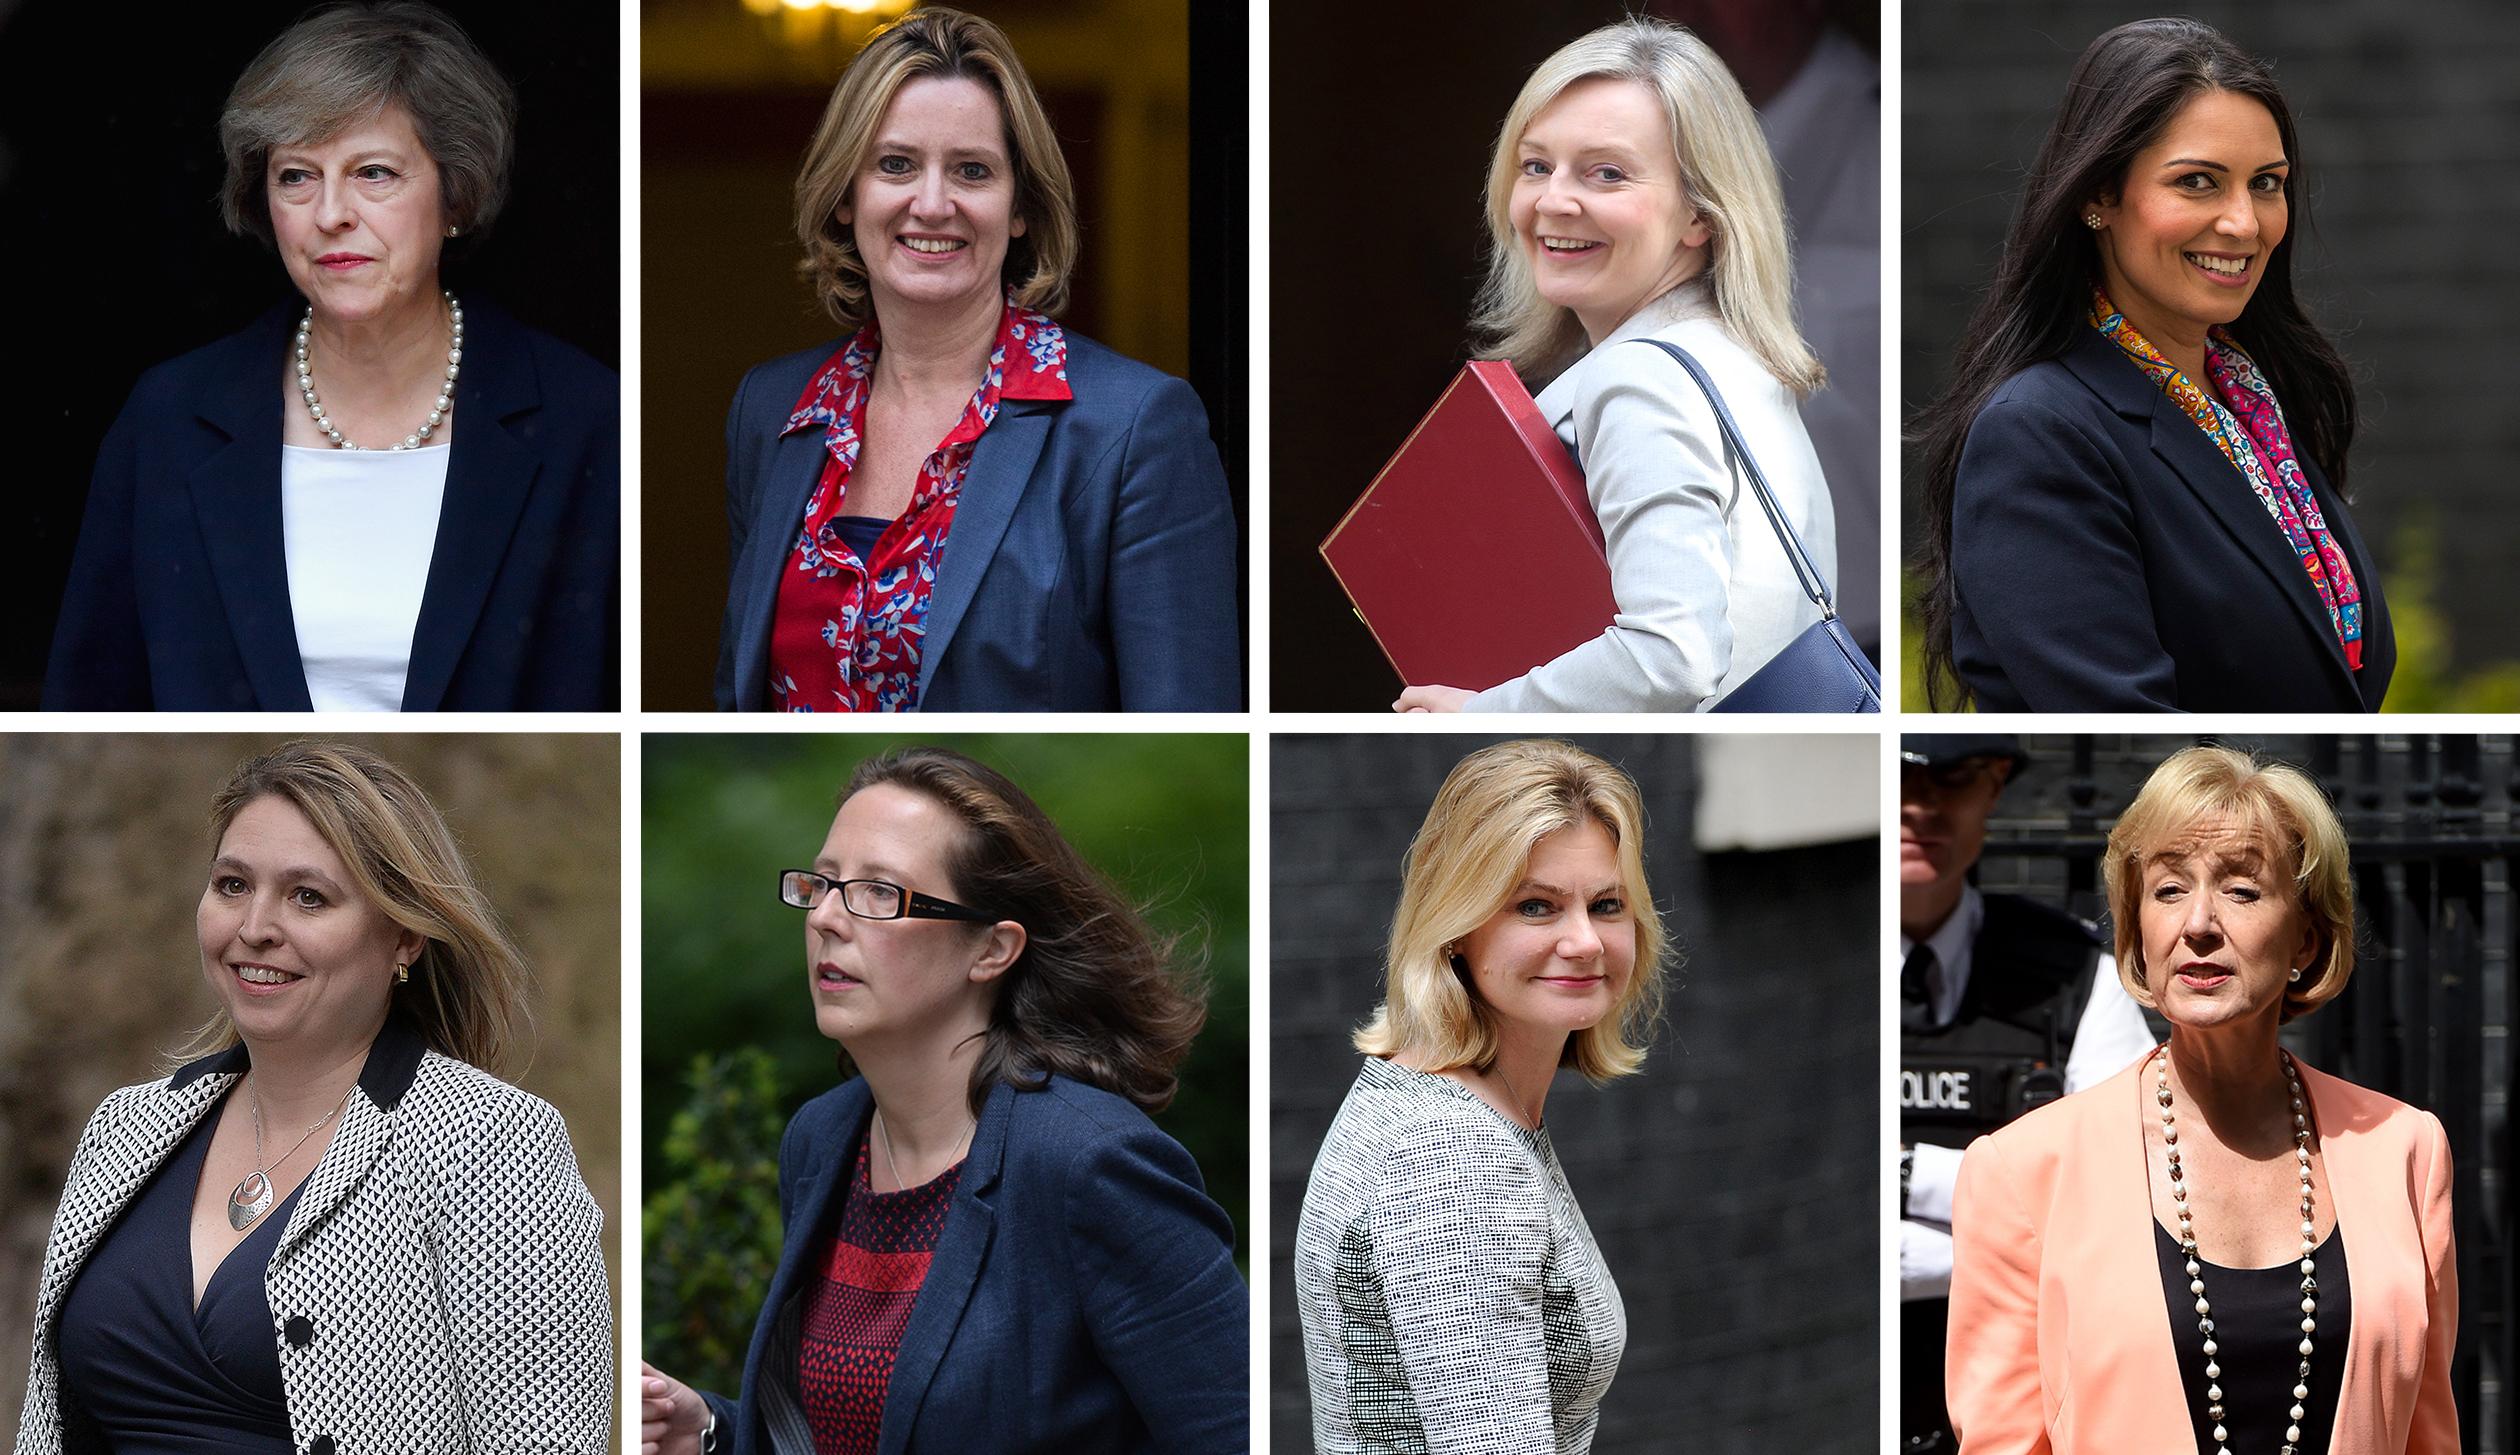 Theresa May, left, Amber Rudd, Liz Truss, Priti Patel, Karen Bradley, Natalie Evans, Justine Greening, and Andrea Leadsom.